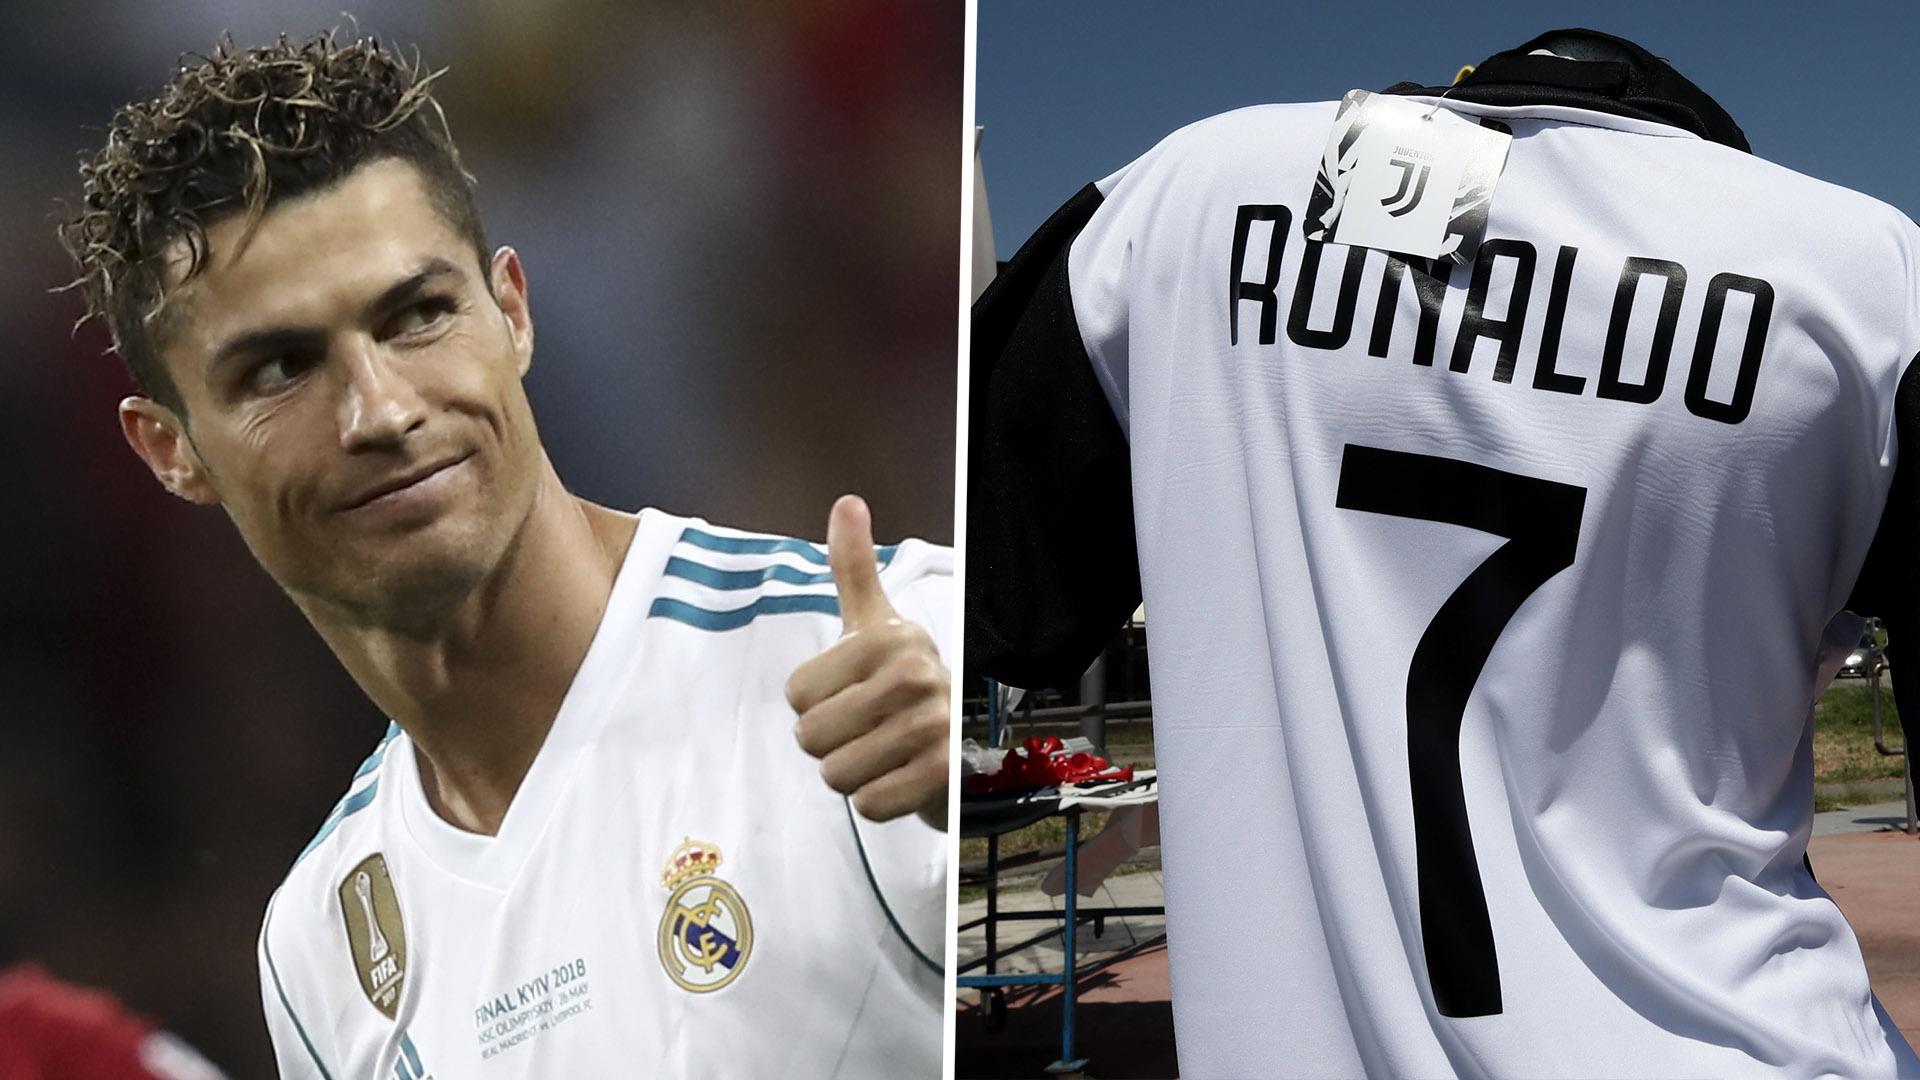 2824e4c2 Live blog: Cristiano Ronaldo leaves Real Madrid for Juventus in €100m  million mega transfer